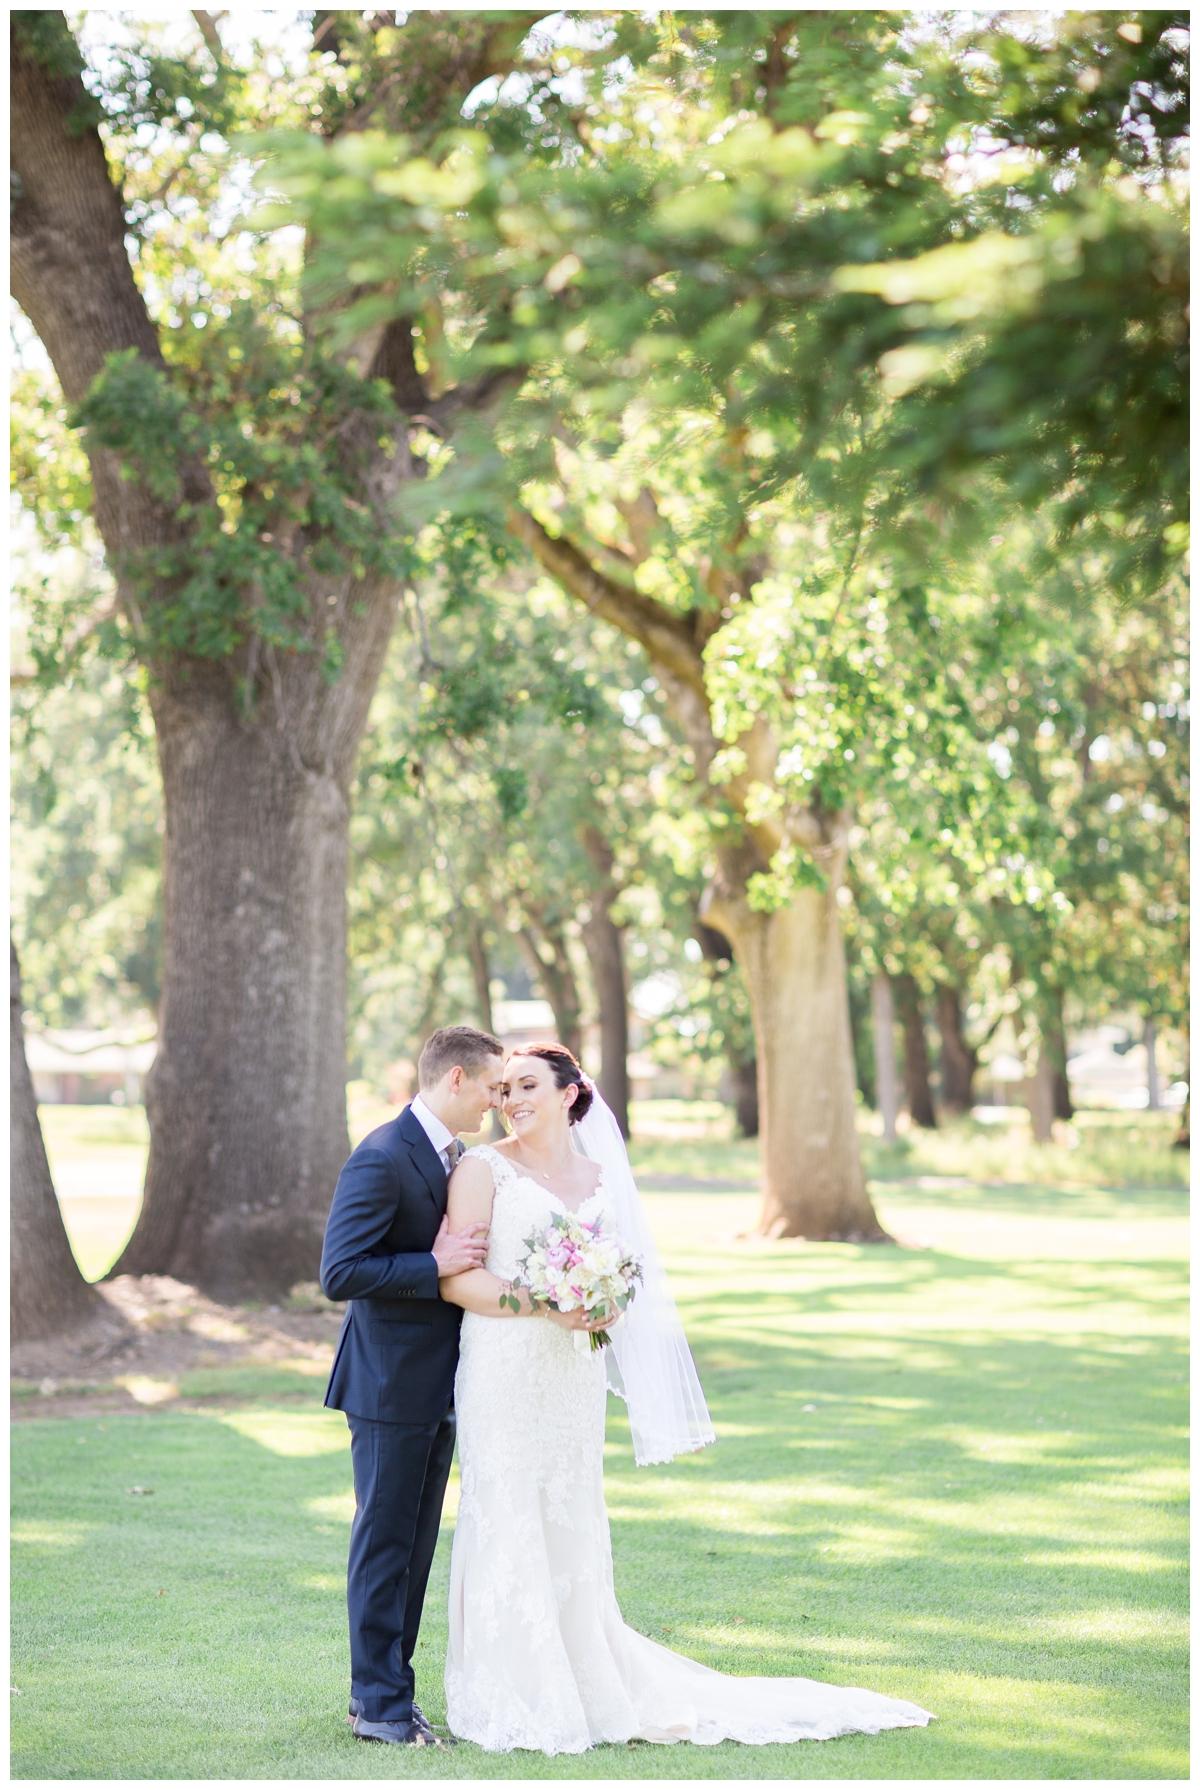 Butte-Creek-Country-Club-Wedding-Photography_5249.jpg